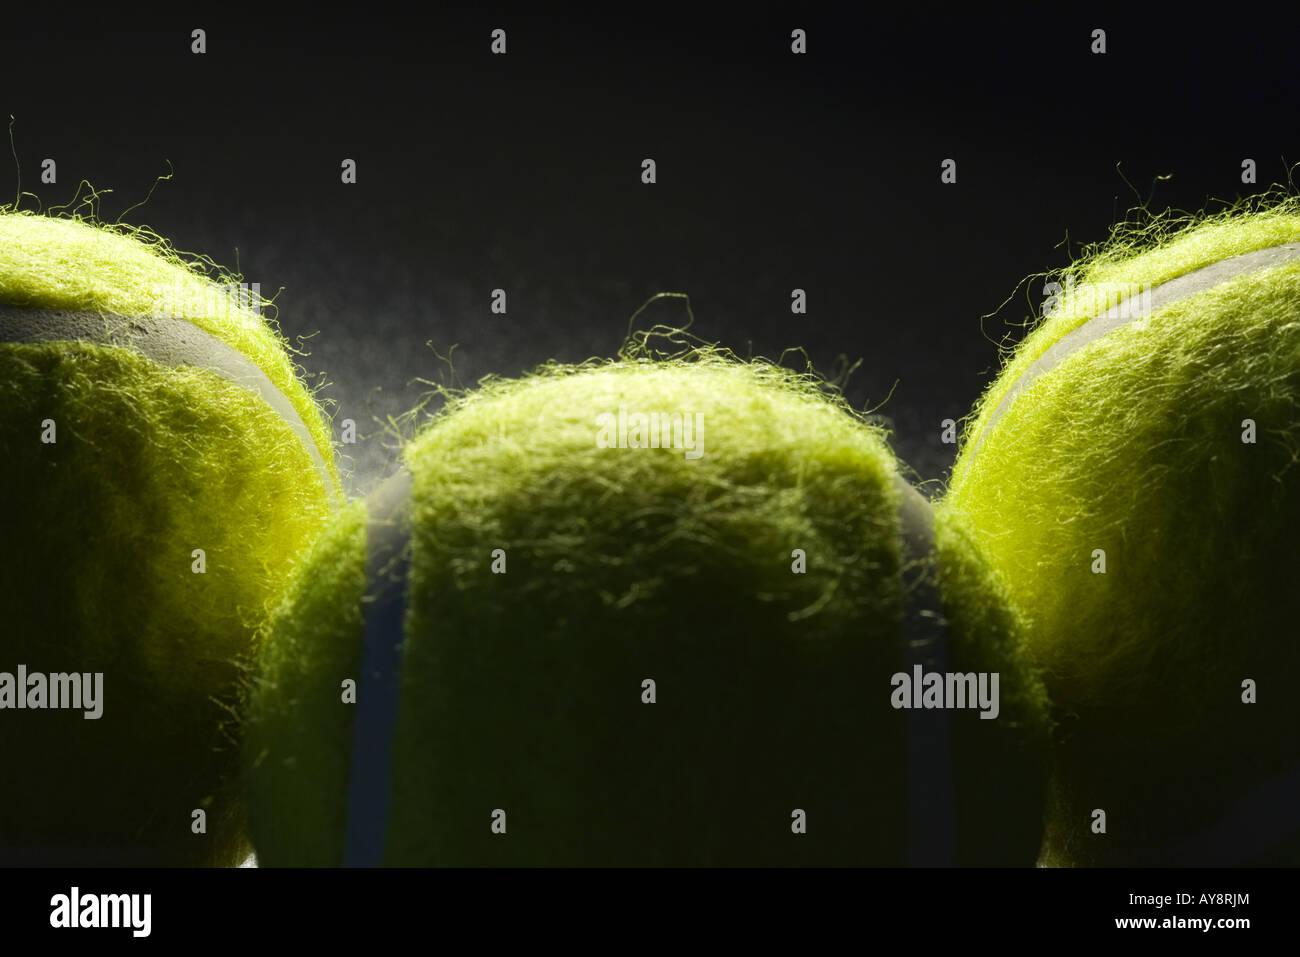 Tennisbälle, extreme Nahaufnahme Stockbild